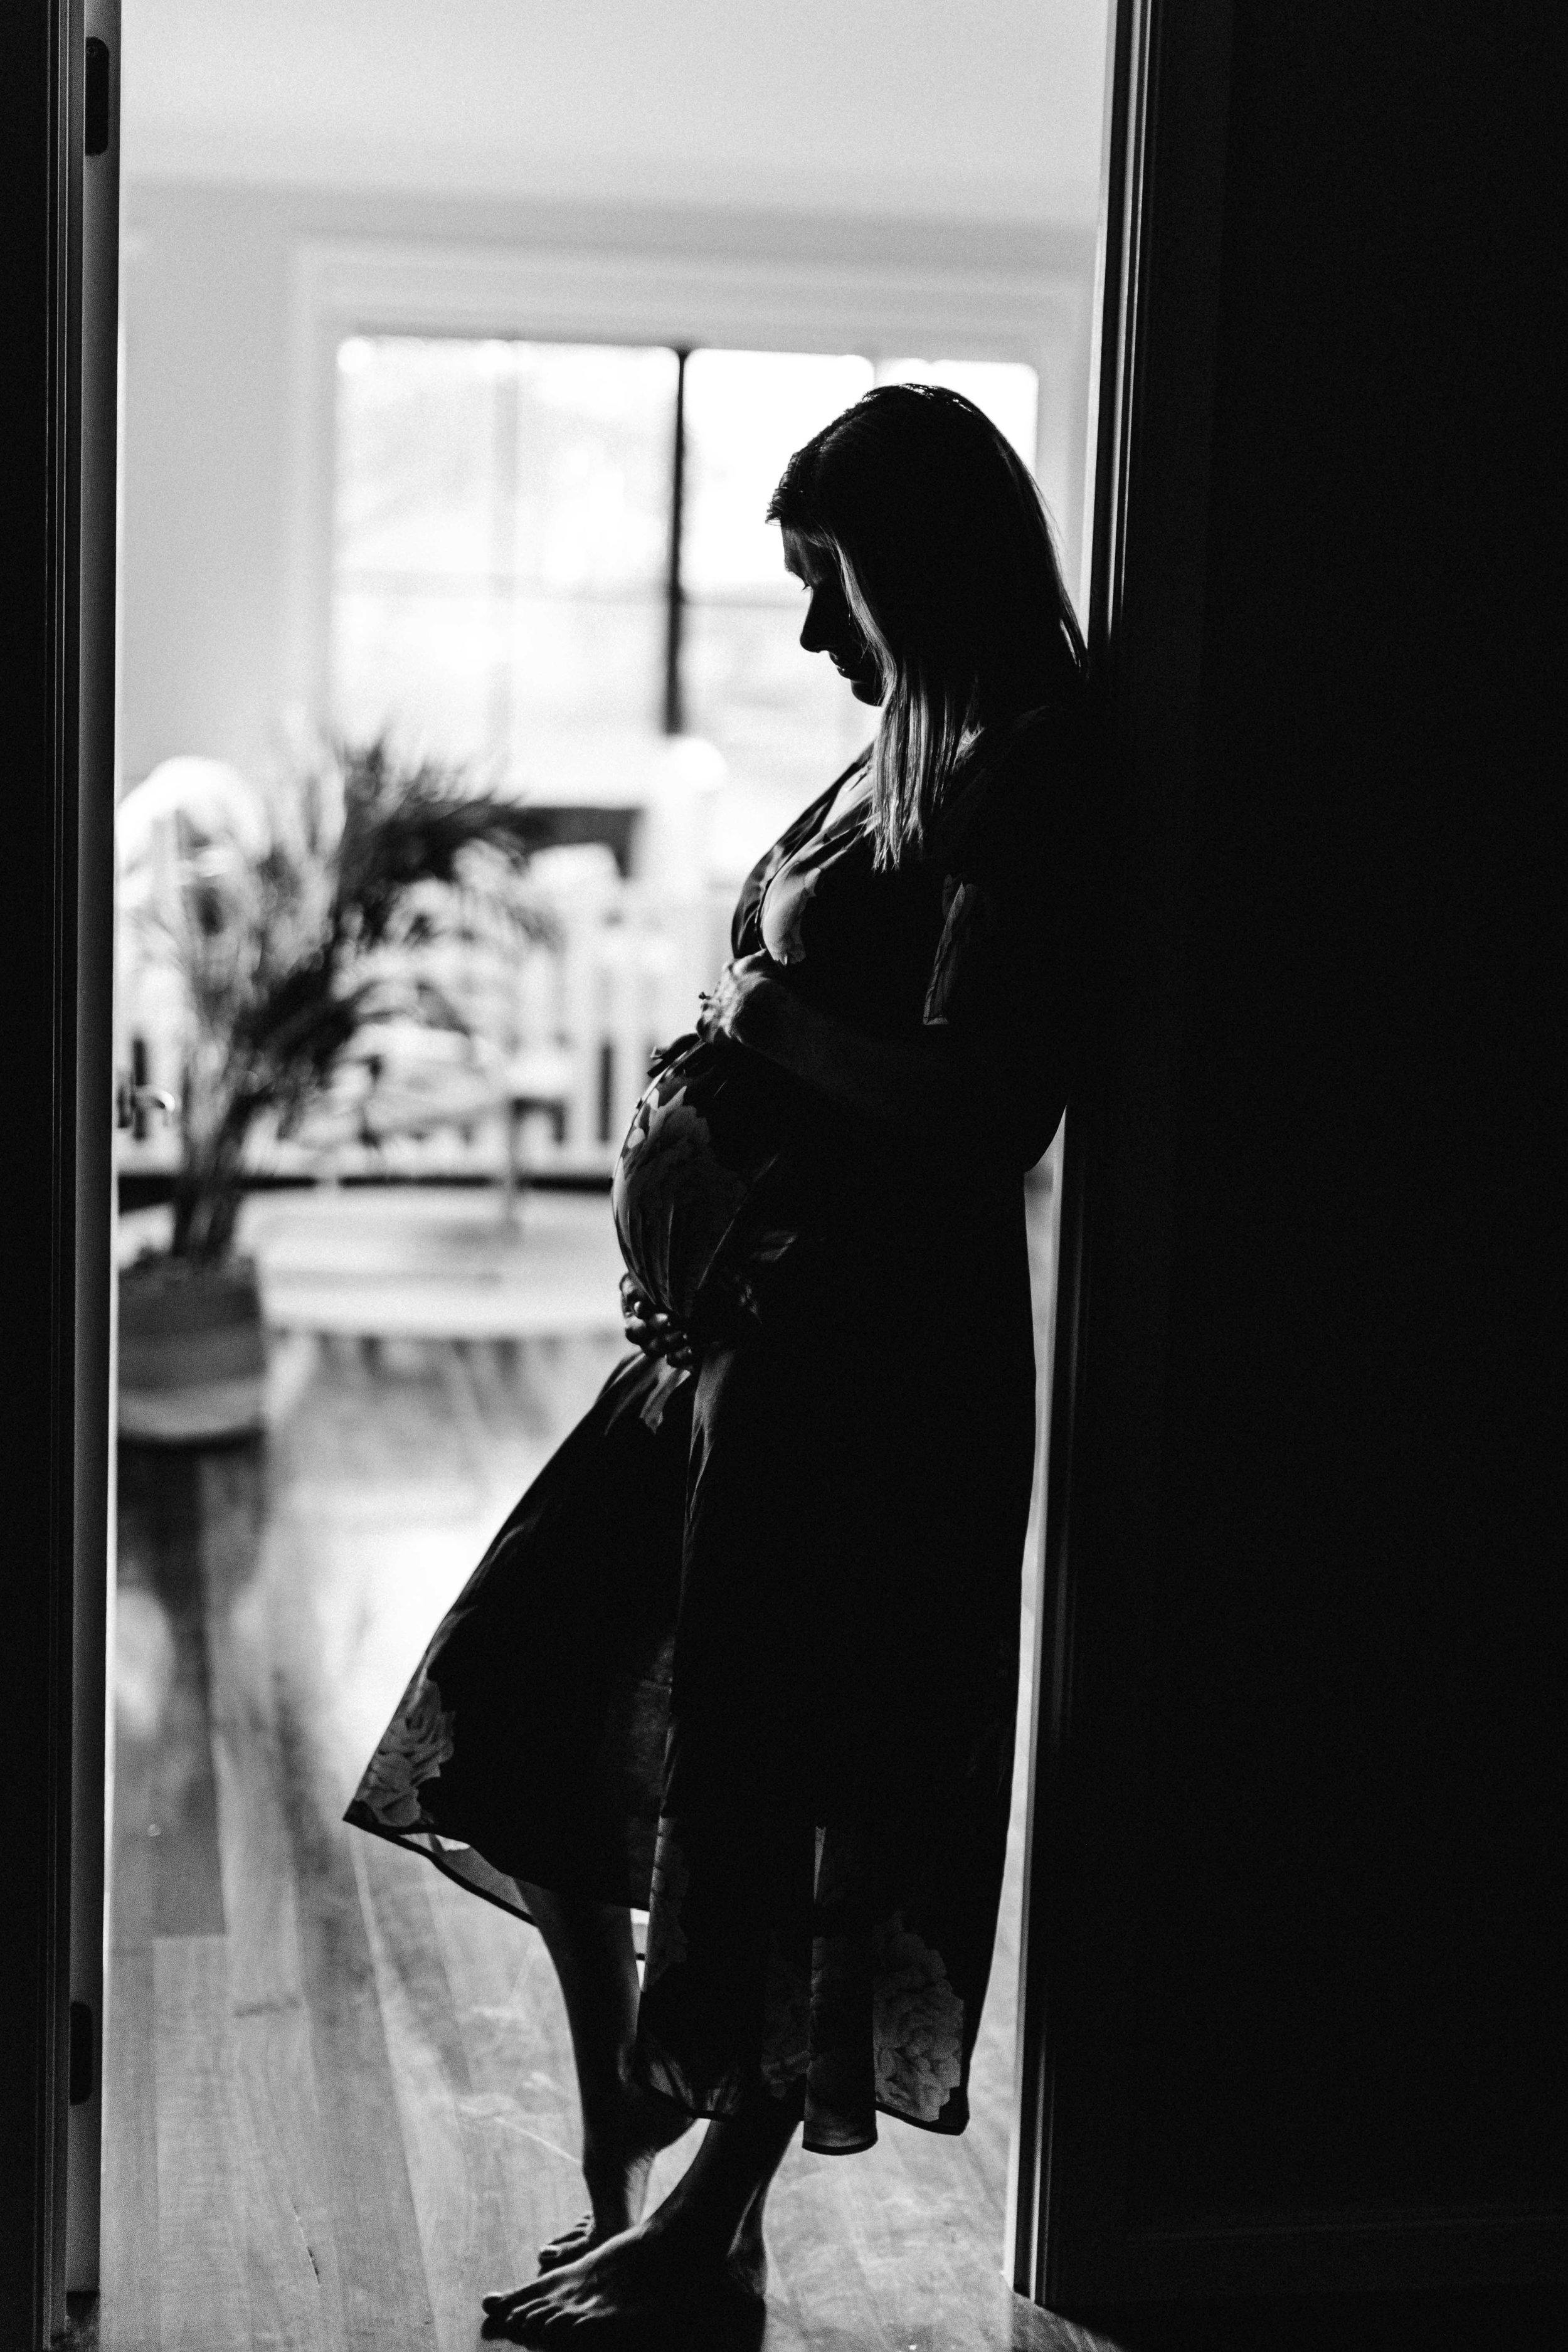 camden-maternity-photography-www.emilyobrienphotography.net-cassandra-51.jpg